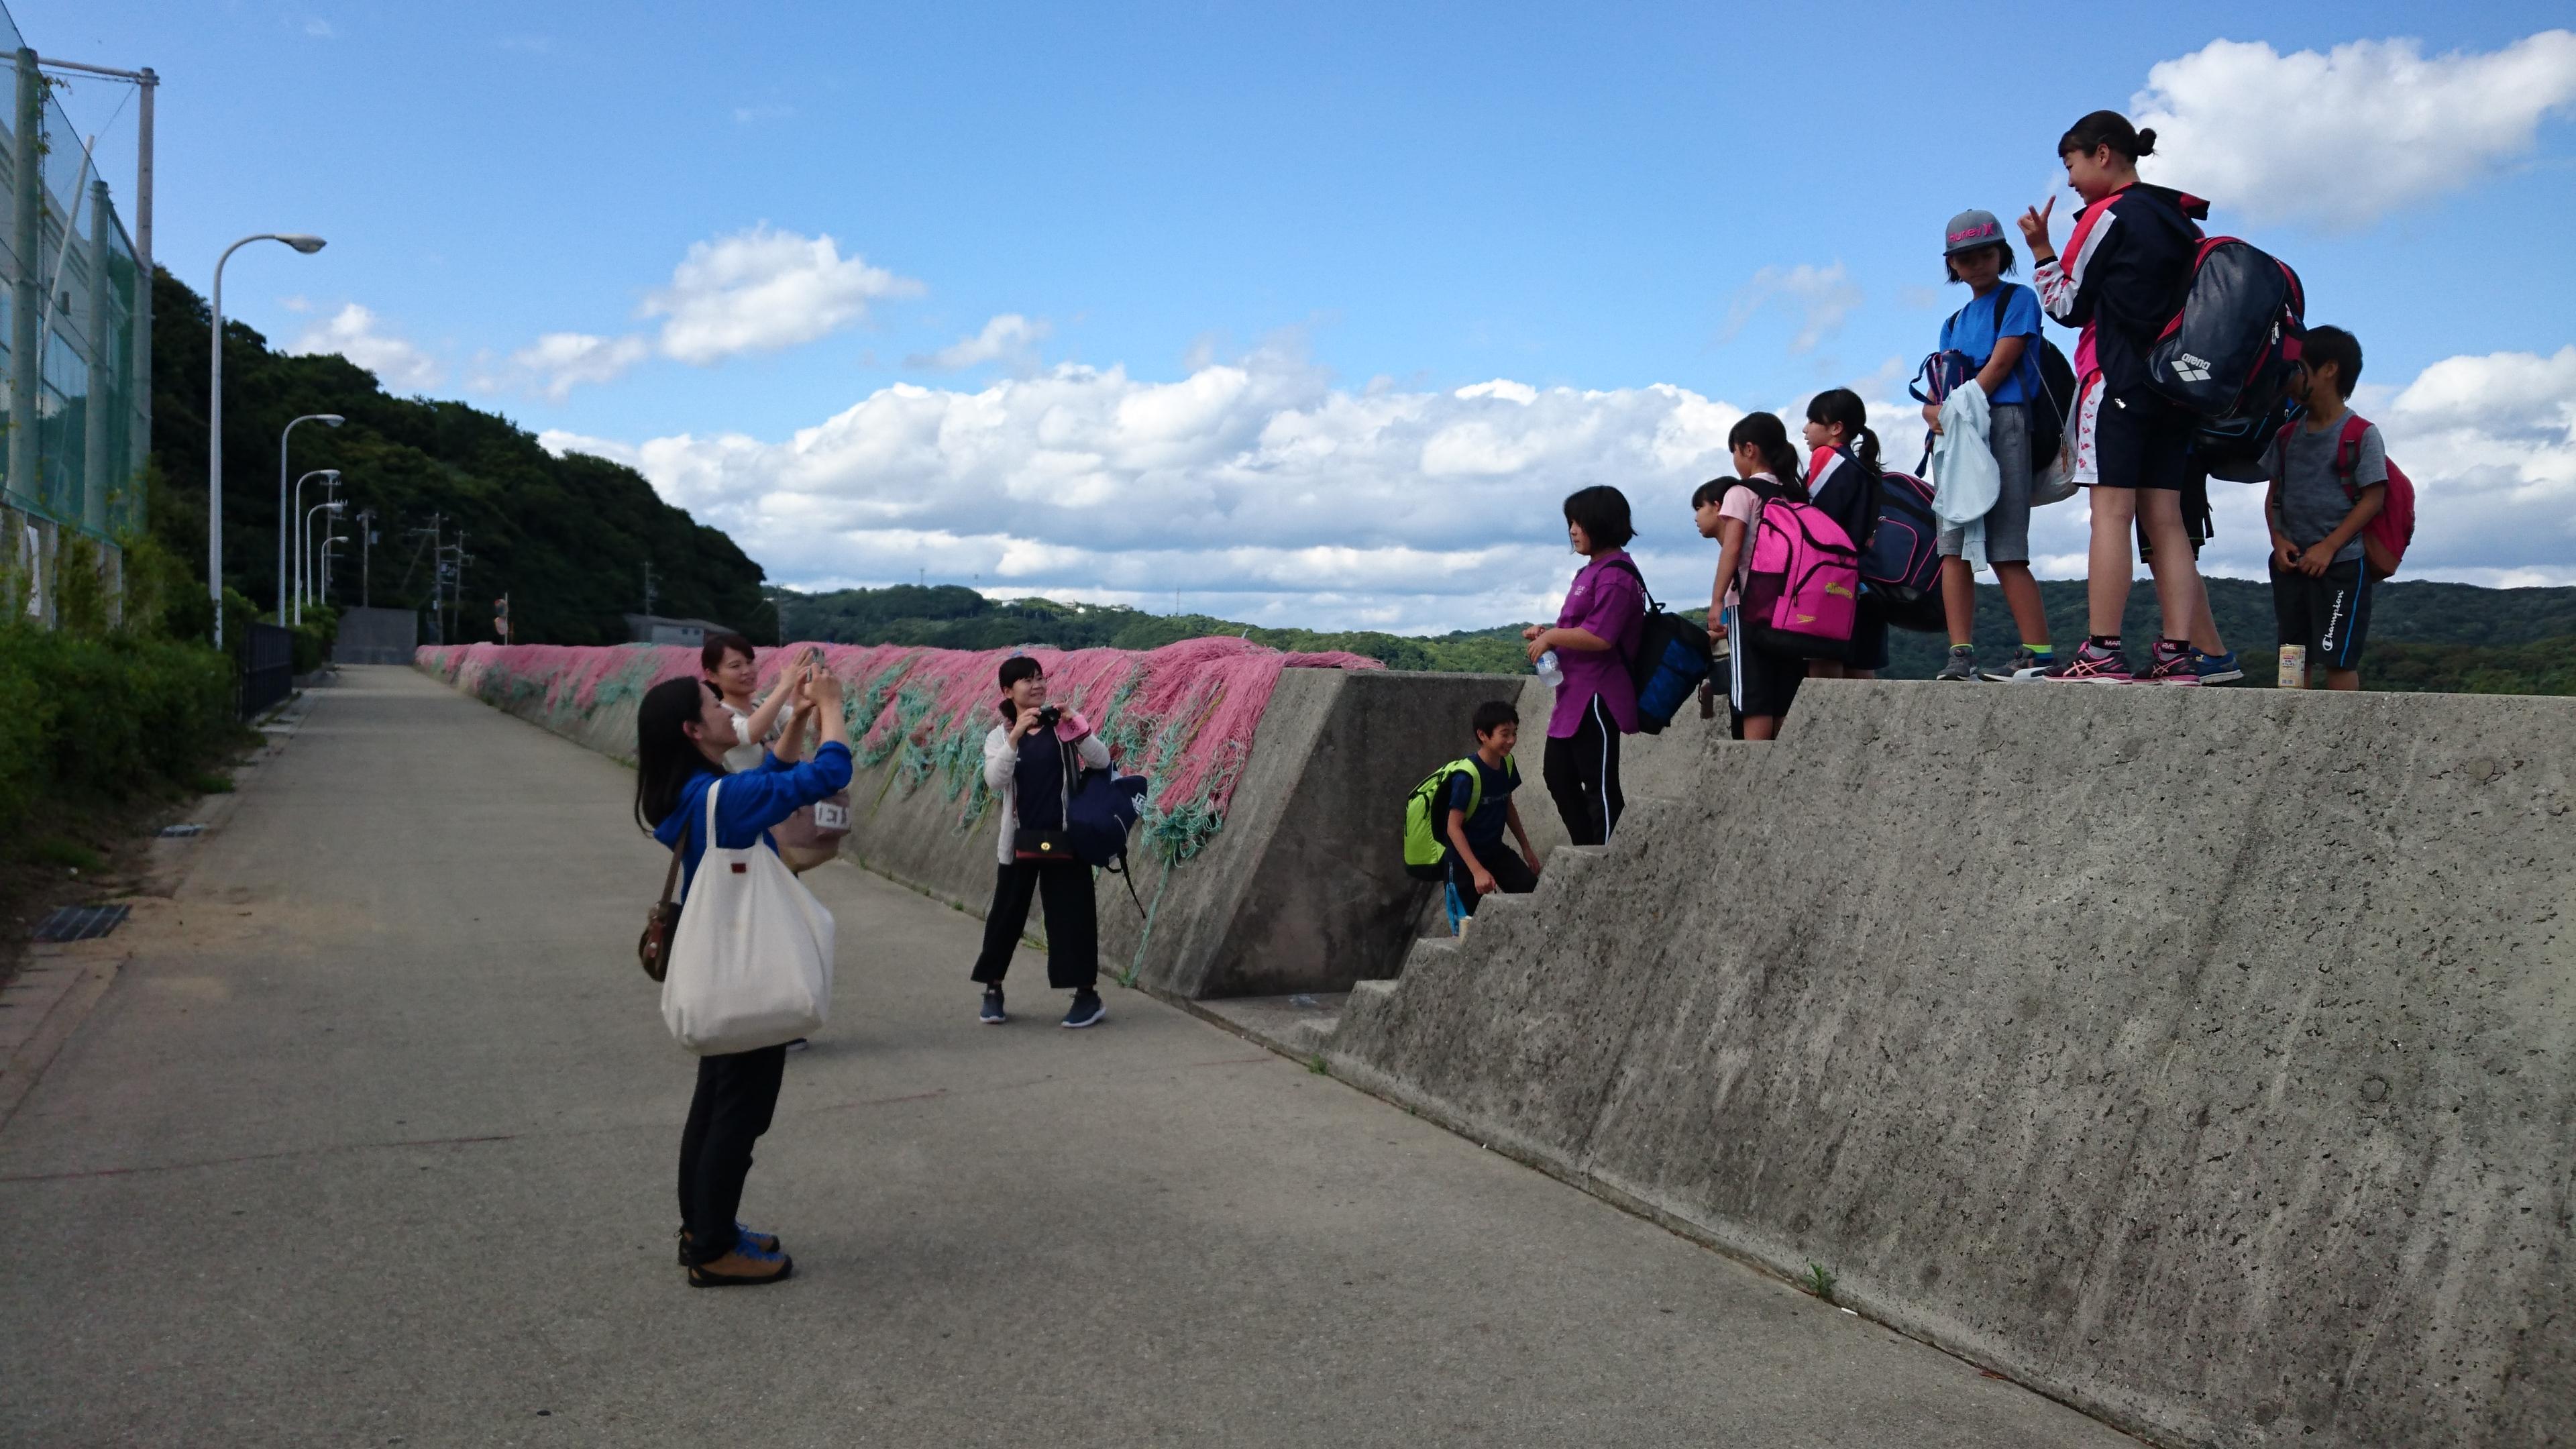 http://aspf.or.jp/inagawabg/staffblog/images/DSC_0466.JPG